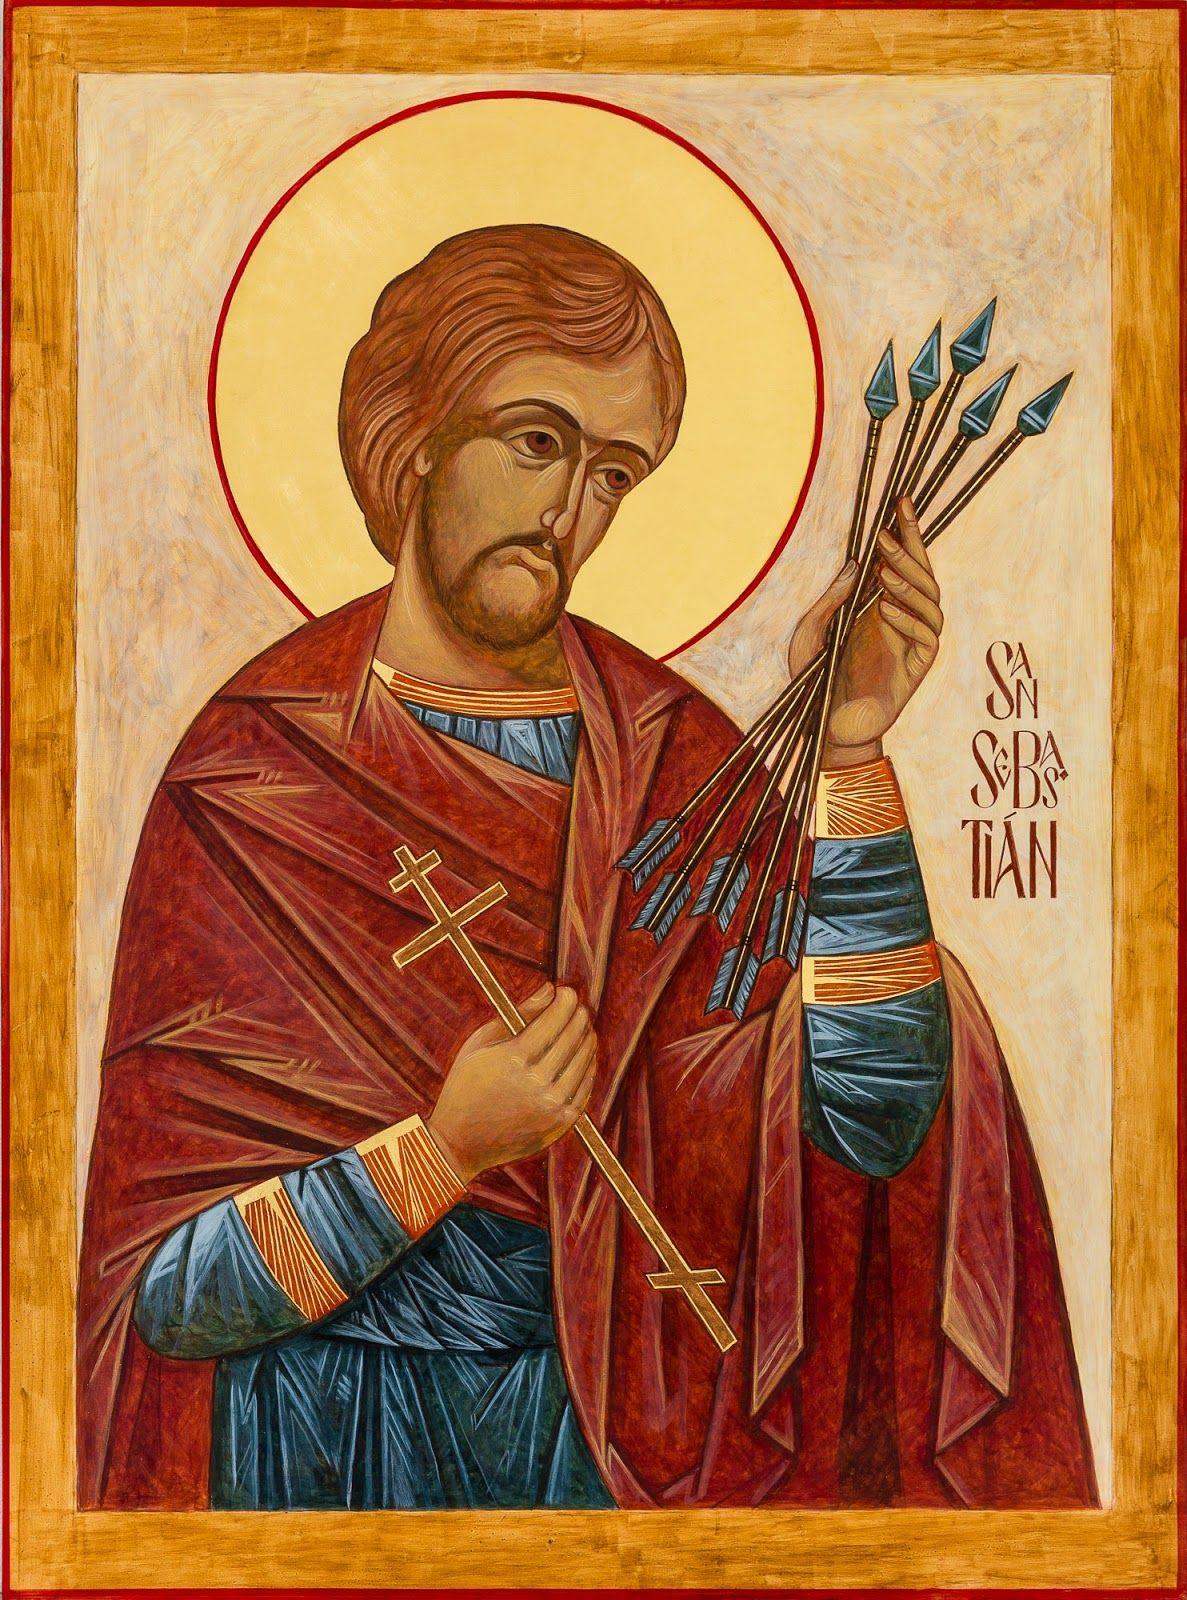 from Ephraim saint sebastian gay icon